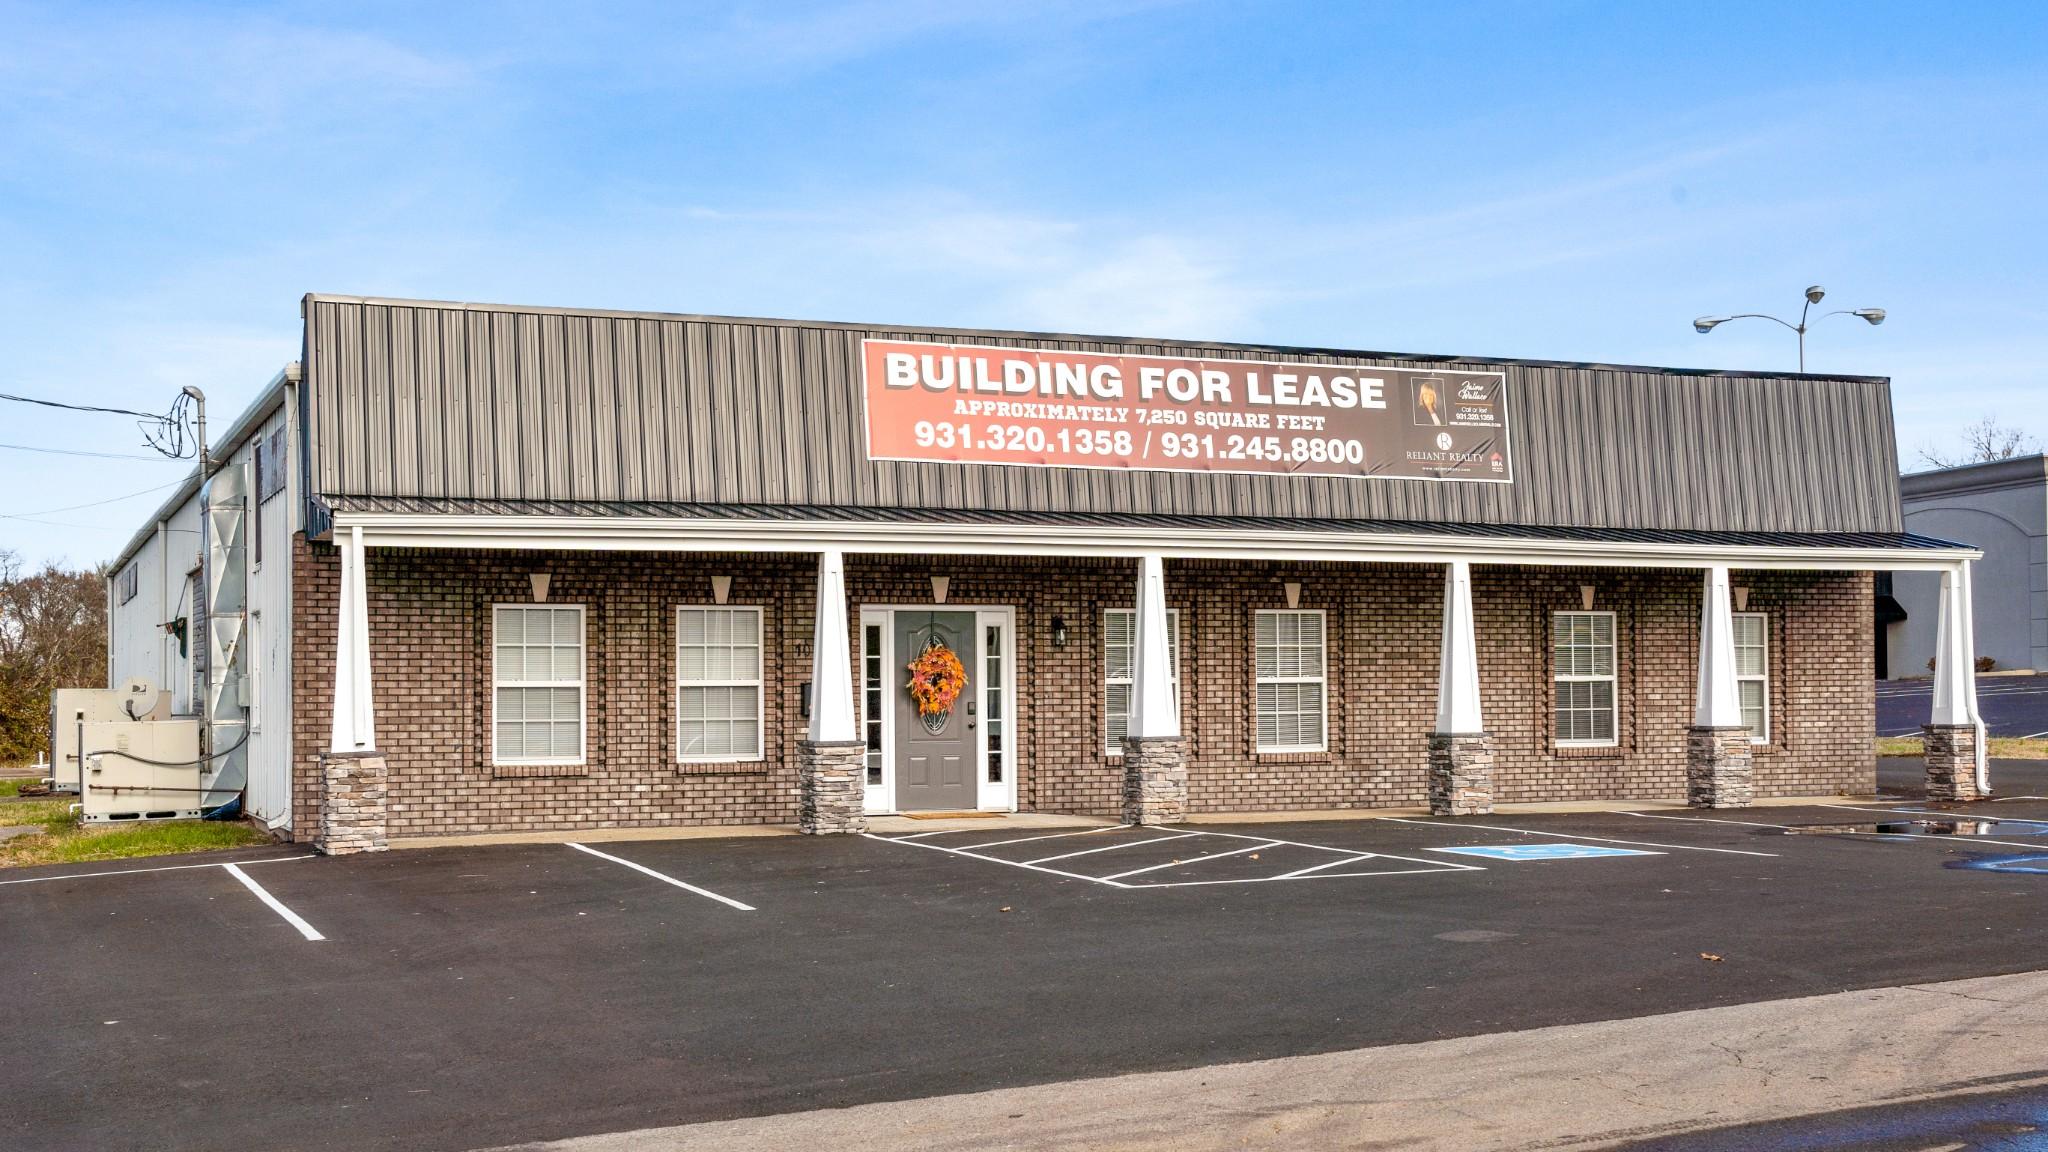 1017 S Riverside Dr, Ste 225M, Clarksville, TN 37040 - Clarksville, TN real estate listing